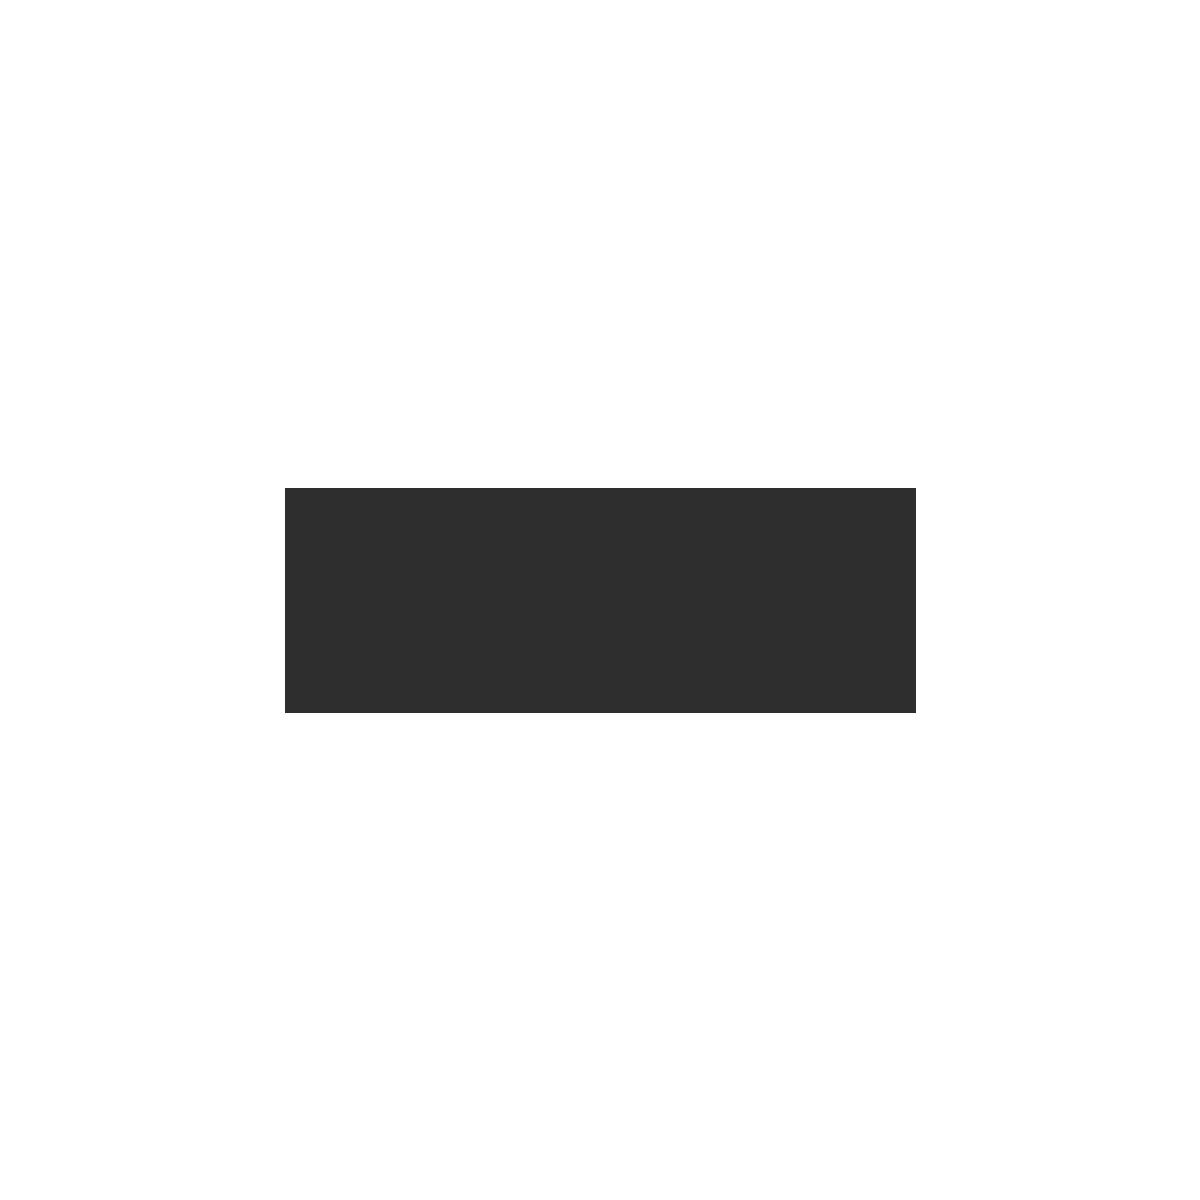 SamrtWorld